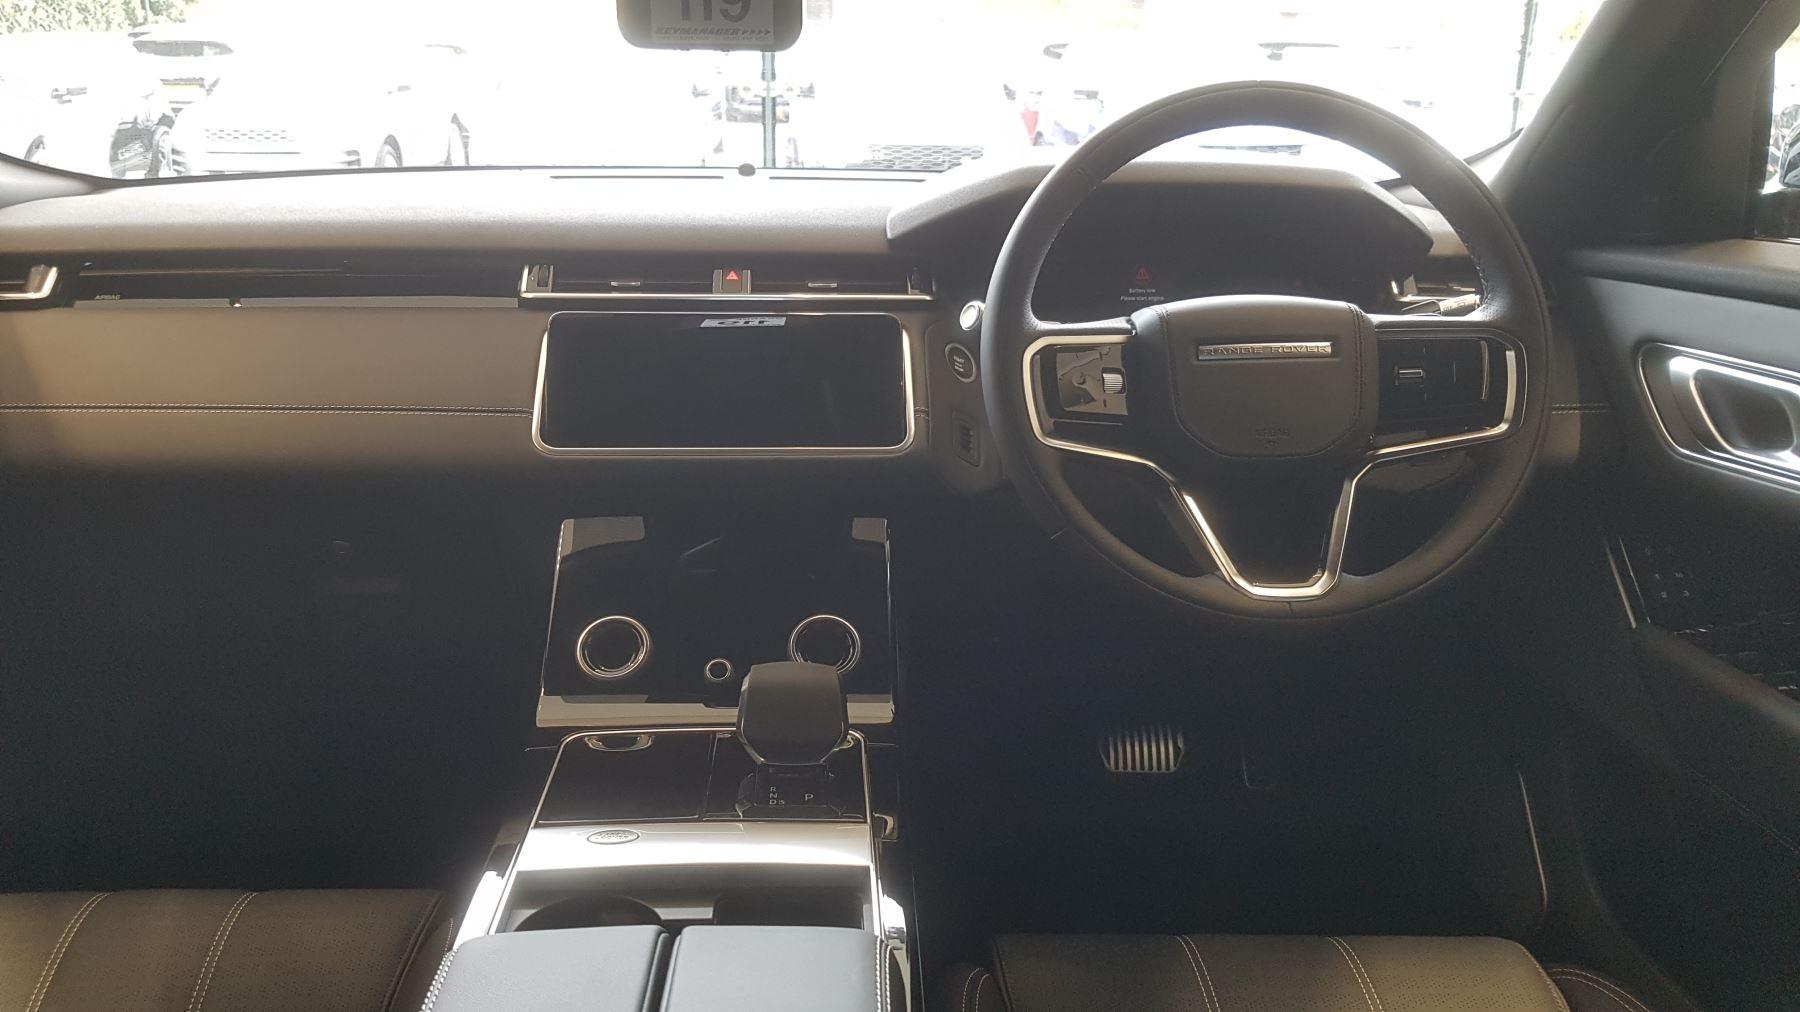 Land Rover Range Rover Velar 3.0 P400 R-Dynamic HSE image 8